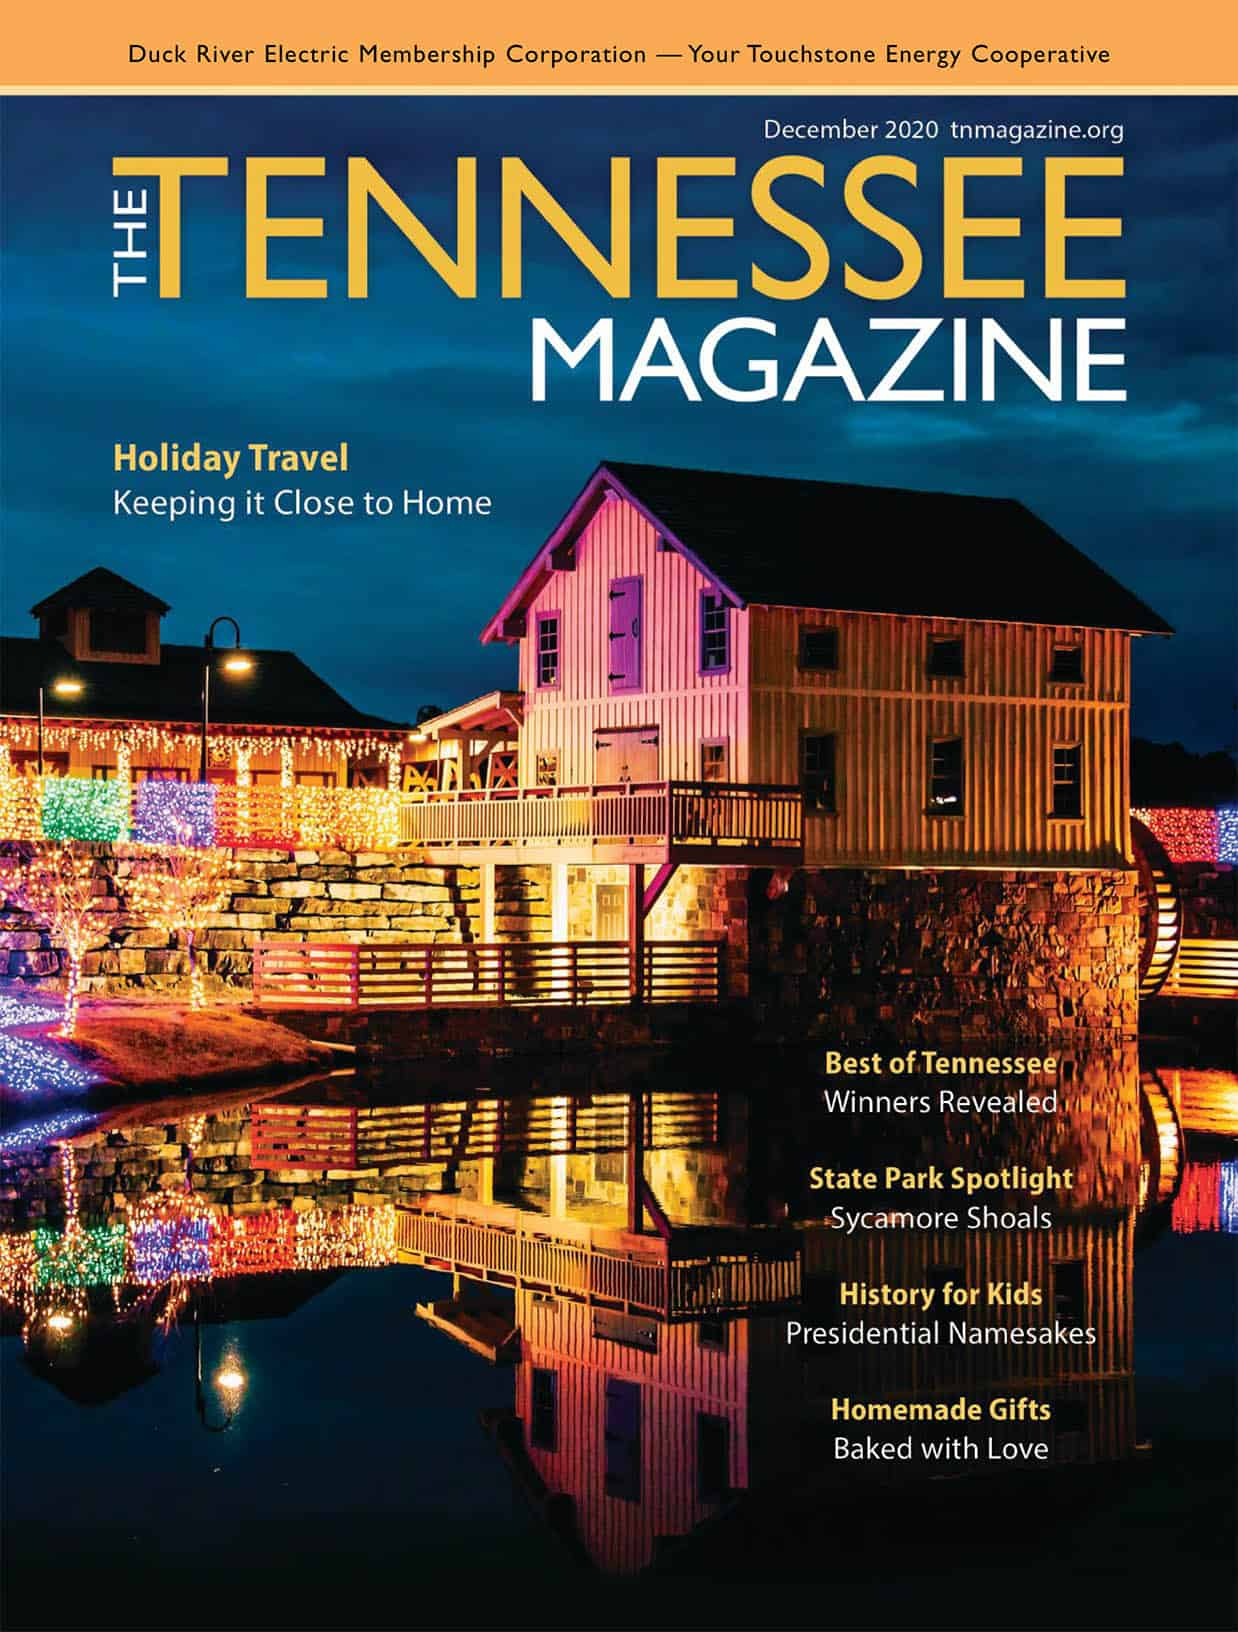 Tennesee Magazine December 2020 Cover